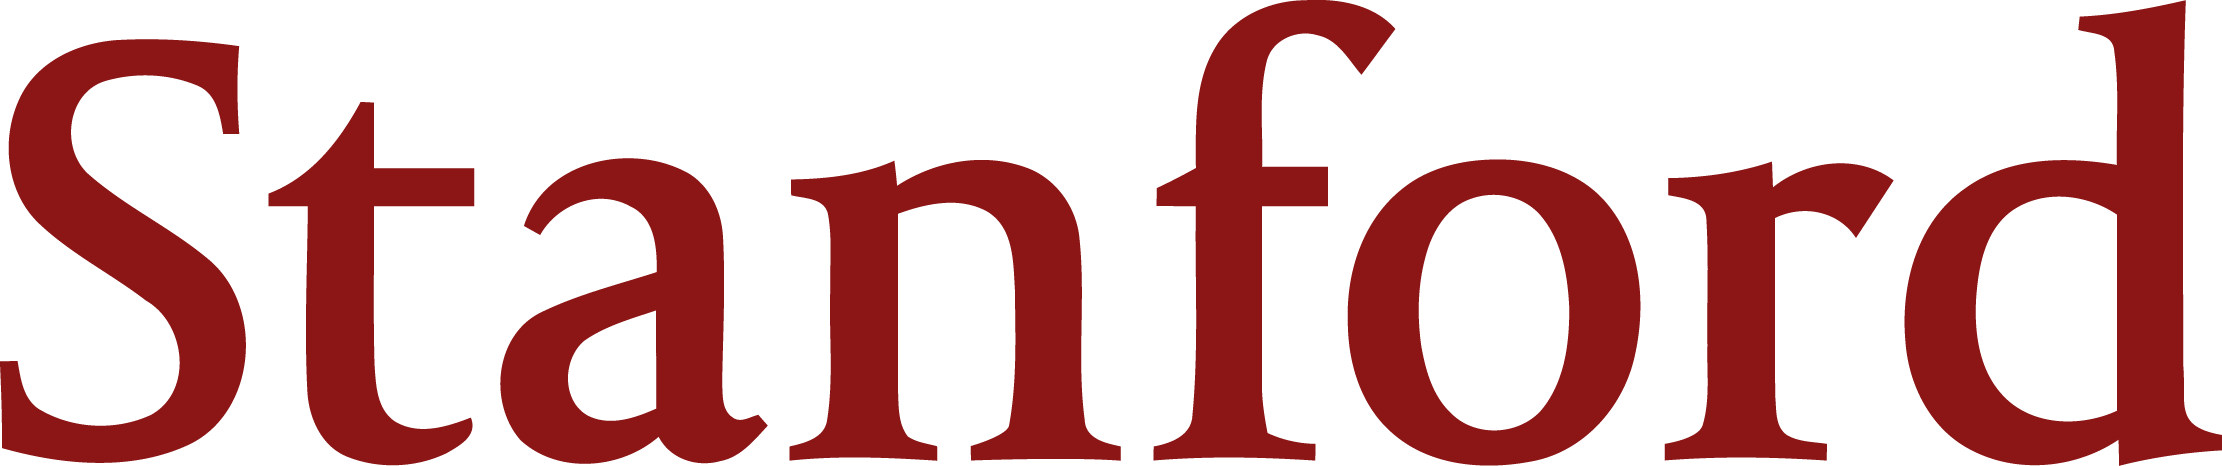 Stanford University_Logo - Stanford University, Transparent background PNG HD thumbnail